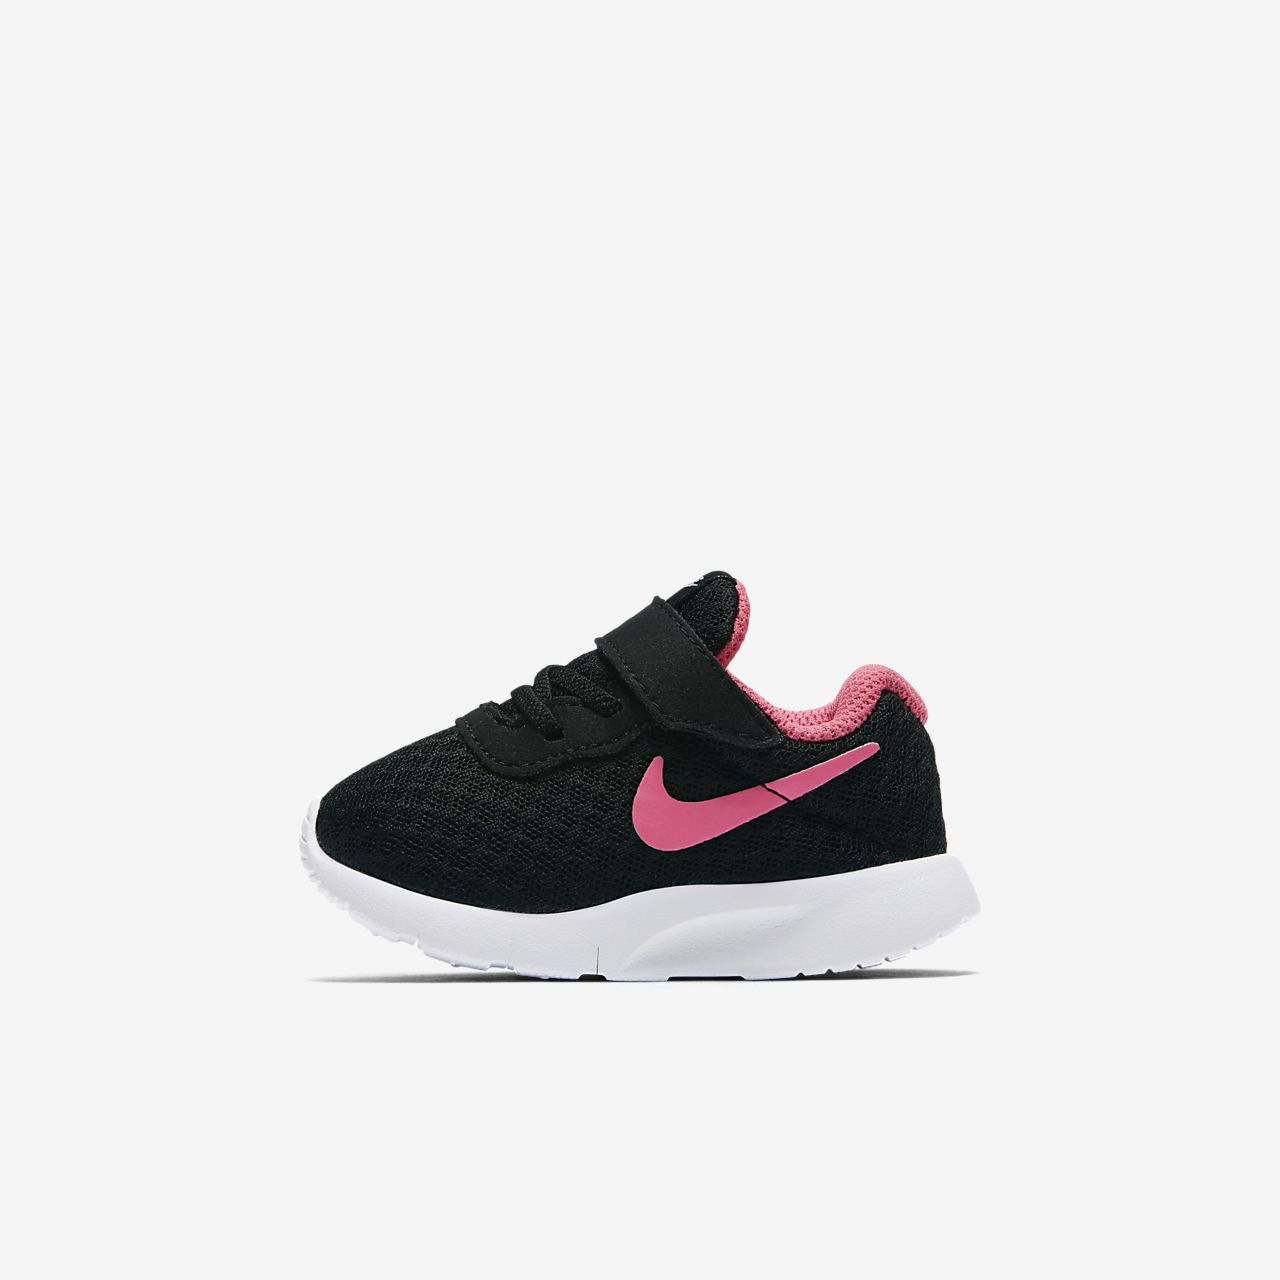 new styles 45a77 bf3b7 ... Sko Nike Tanjun för små barn (storlek 17–27)